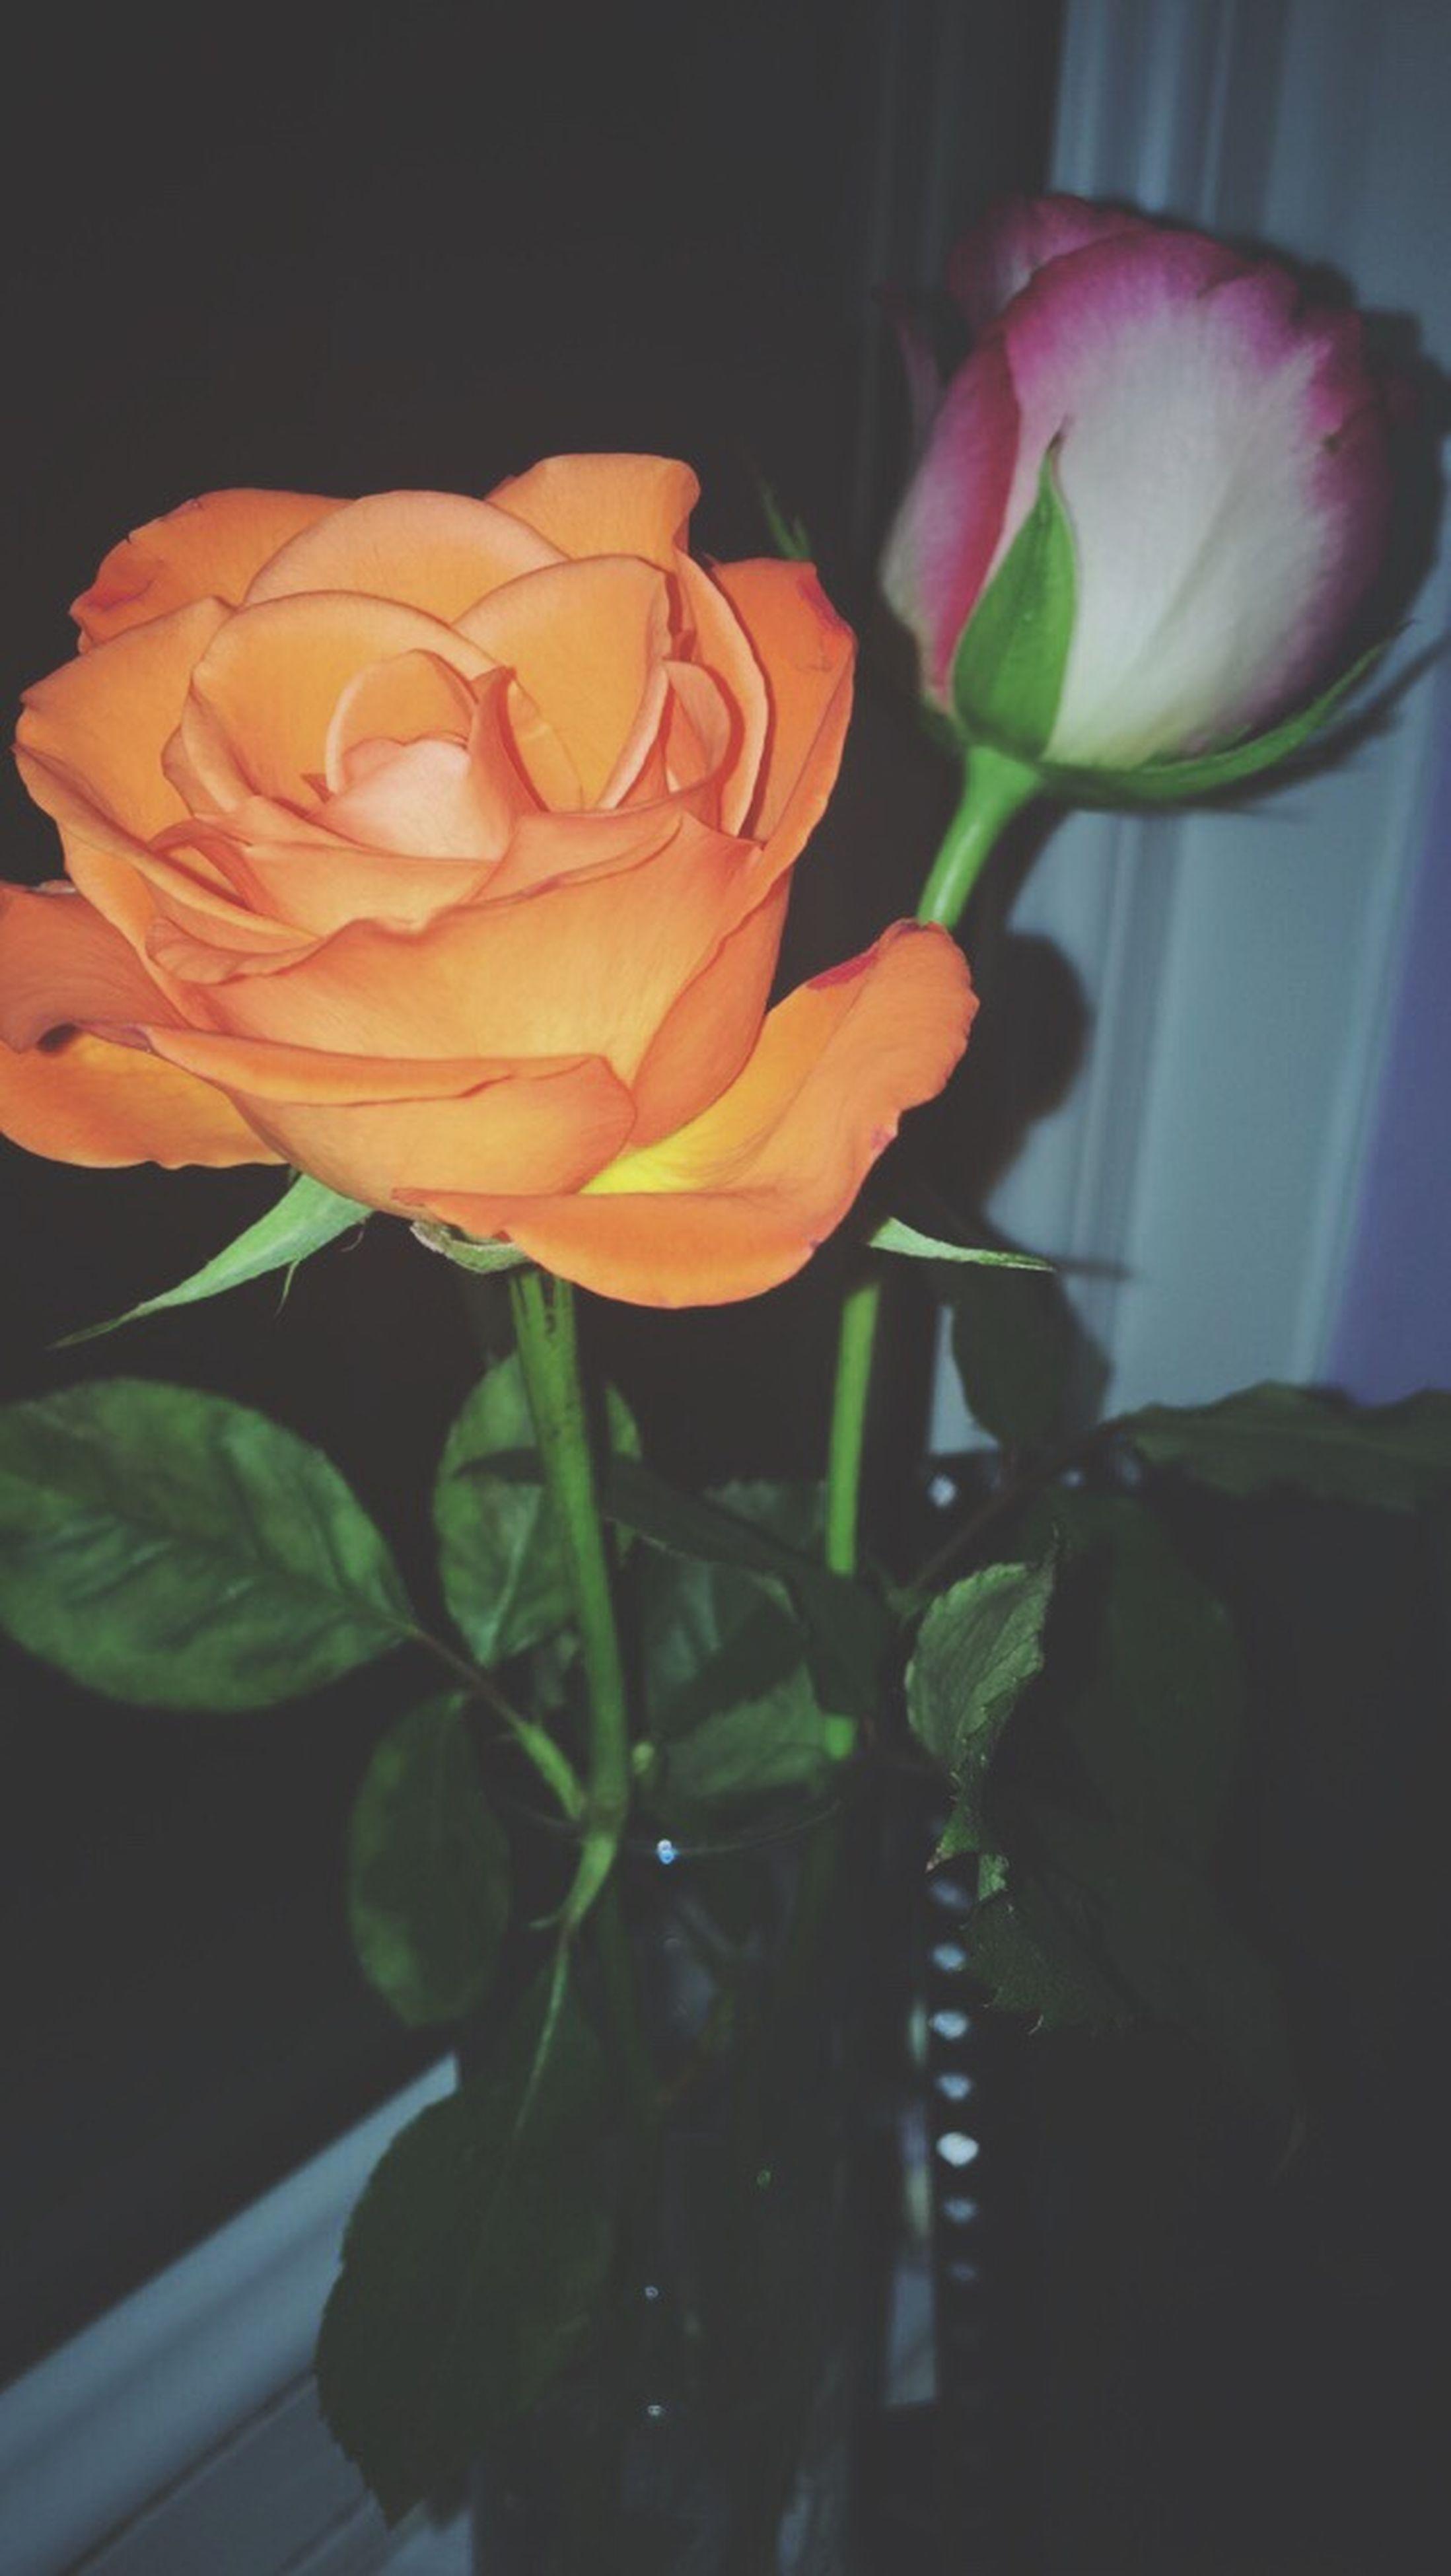 flower, petal, flower head, fragility, freshness, rose - flower, indoors, beauty in nature, close-up, growth, vase, nature, plant, blooming, rose, leaf, stem, in bloom, no people, tulip